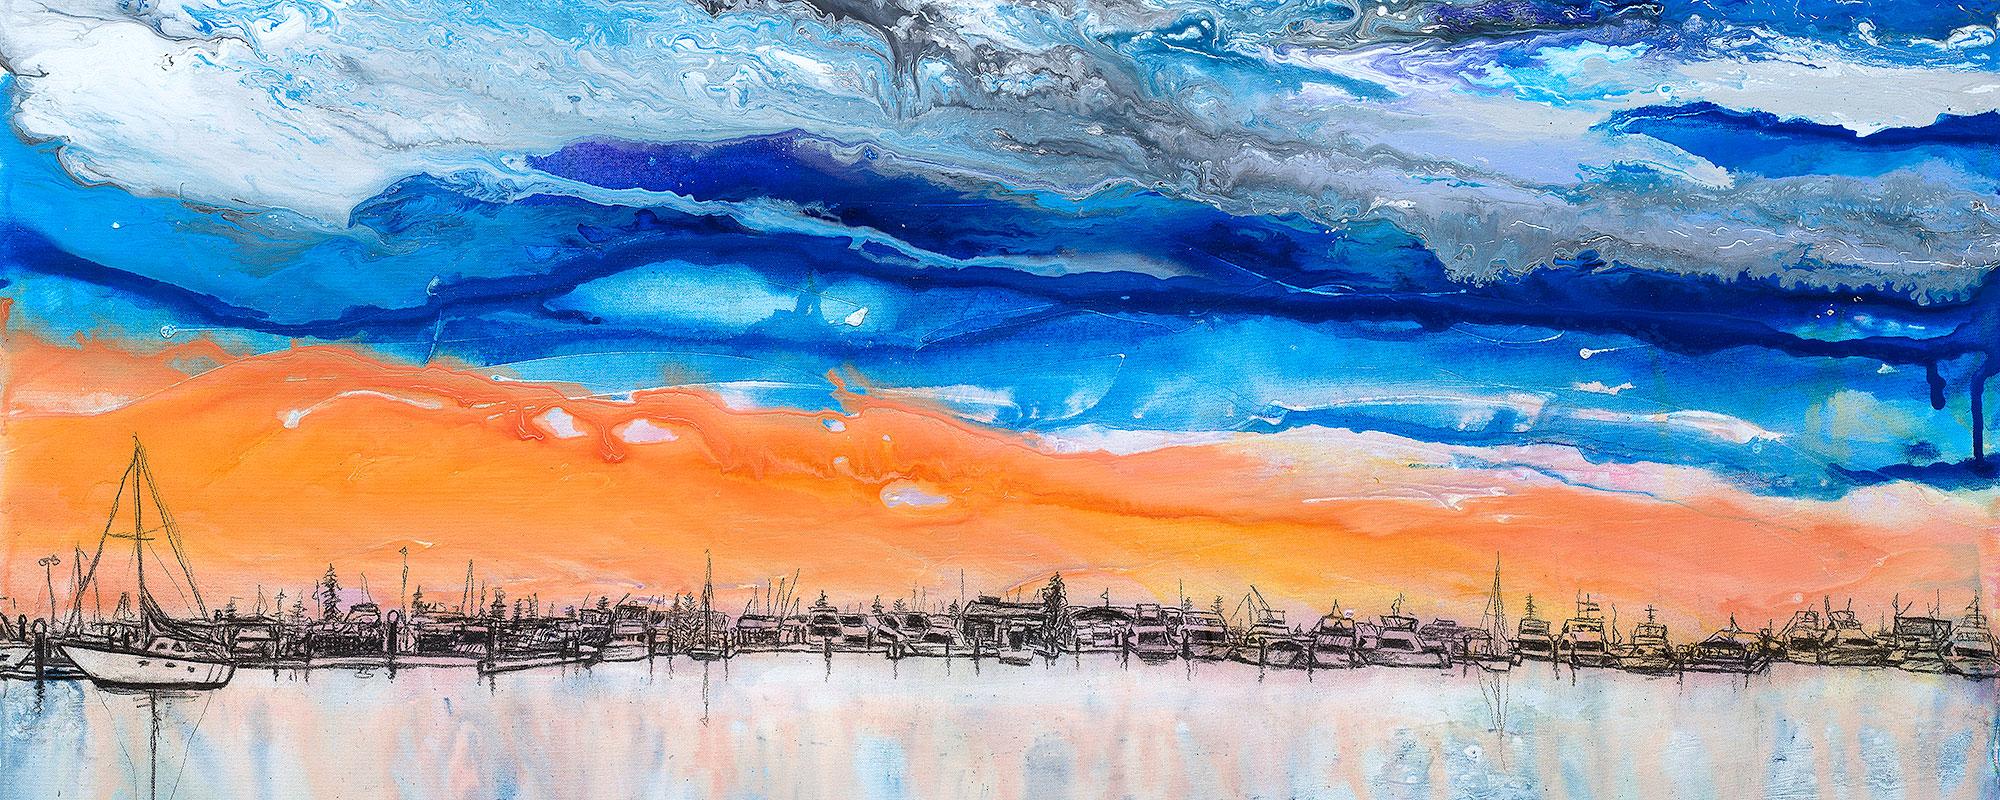 Mirella Prolongeau - 'Fremantle Boats' bio page